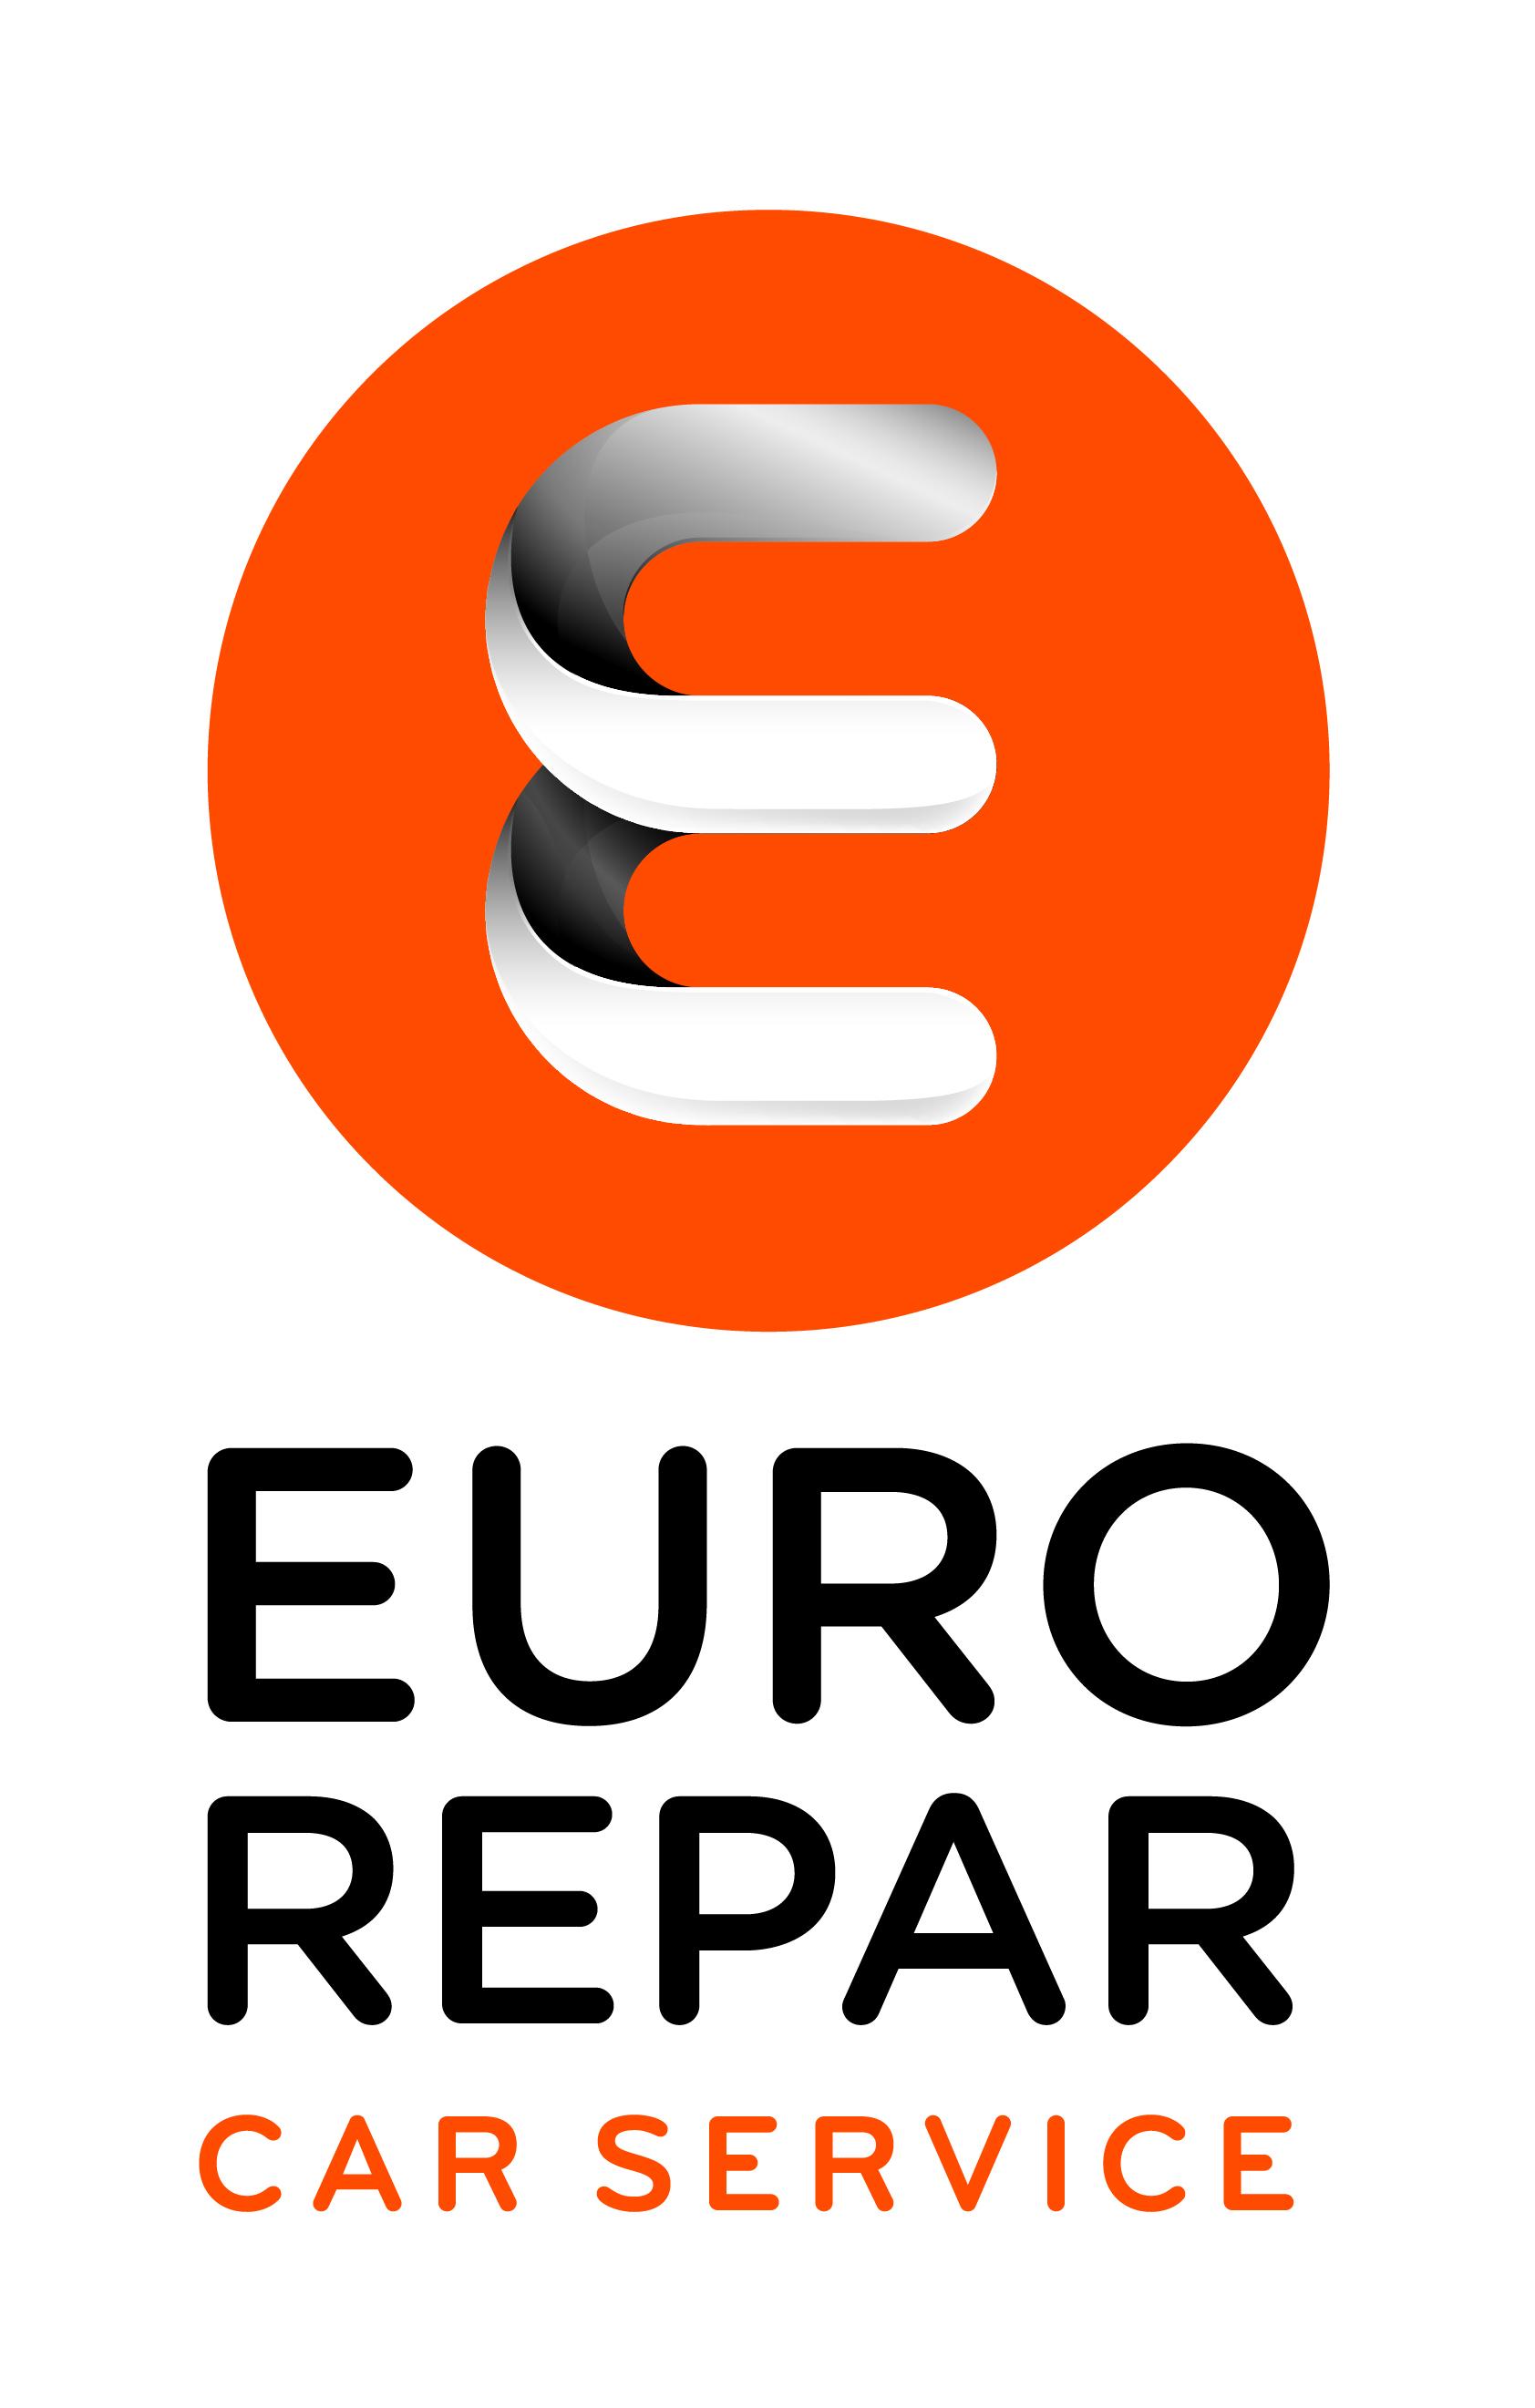 Car Service Erkens GmbH logo